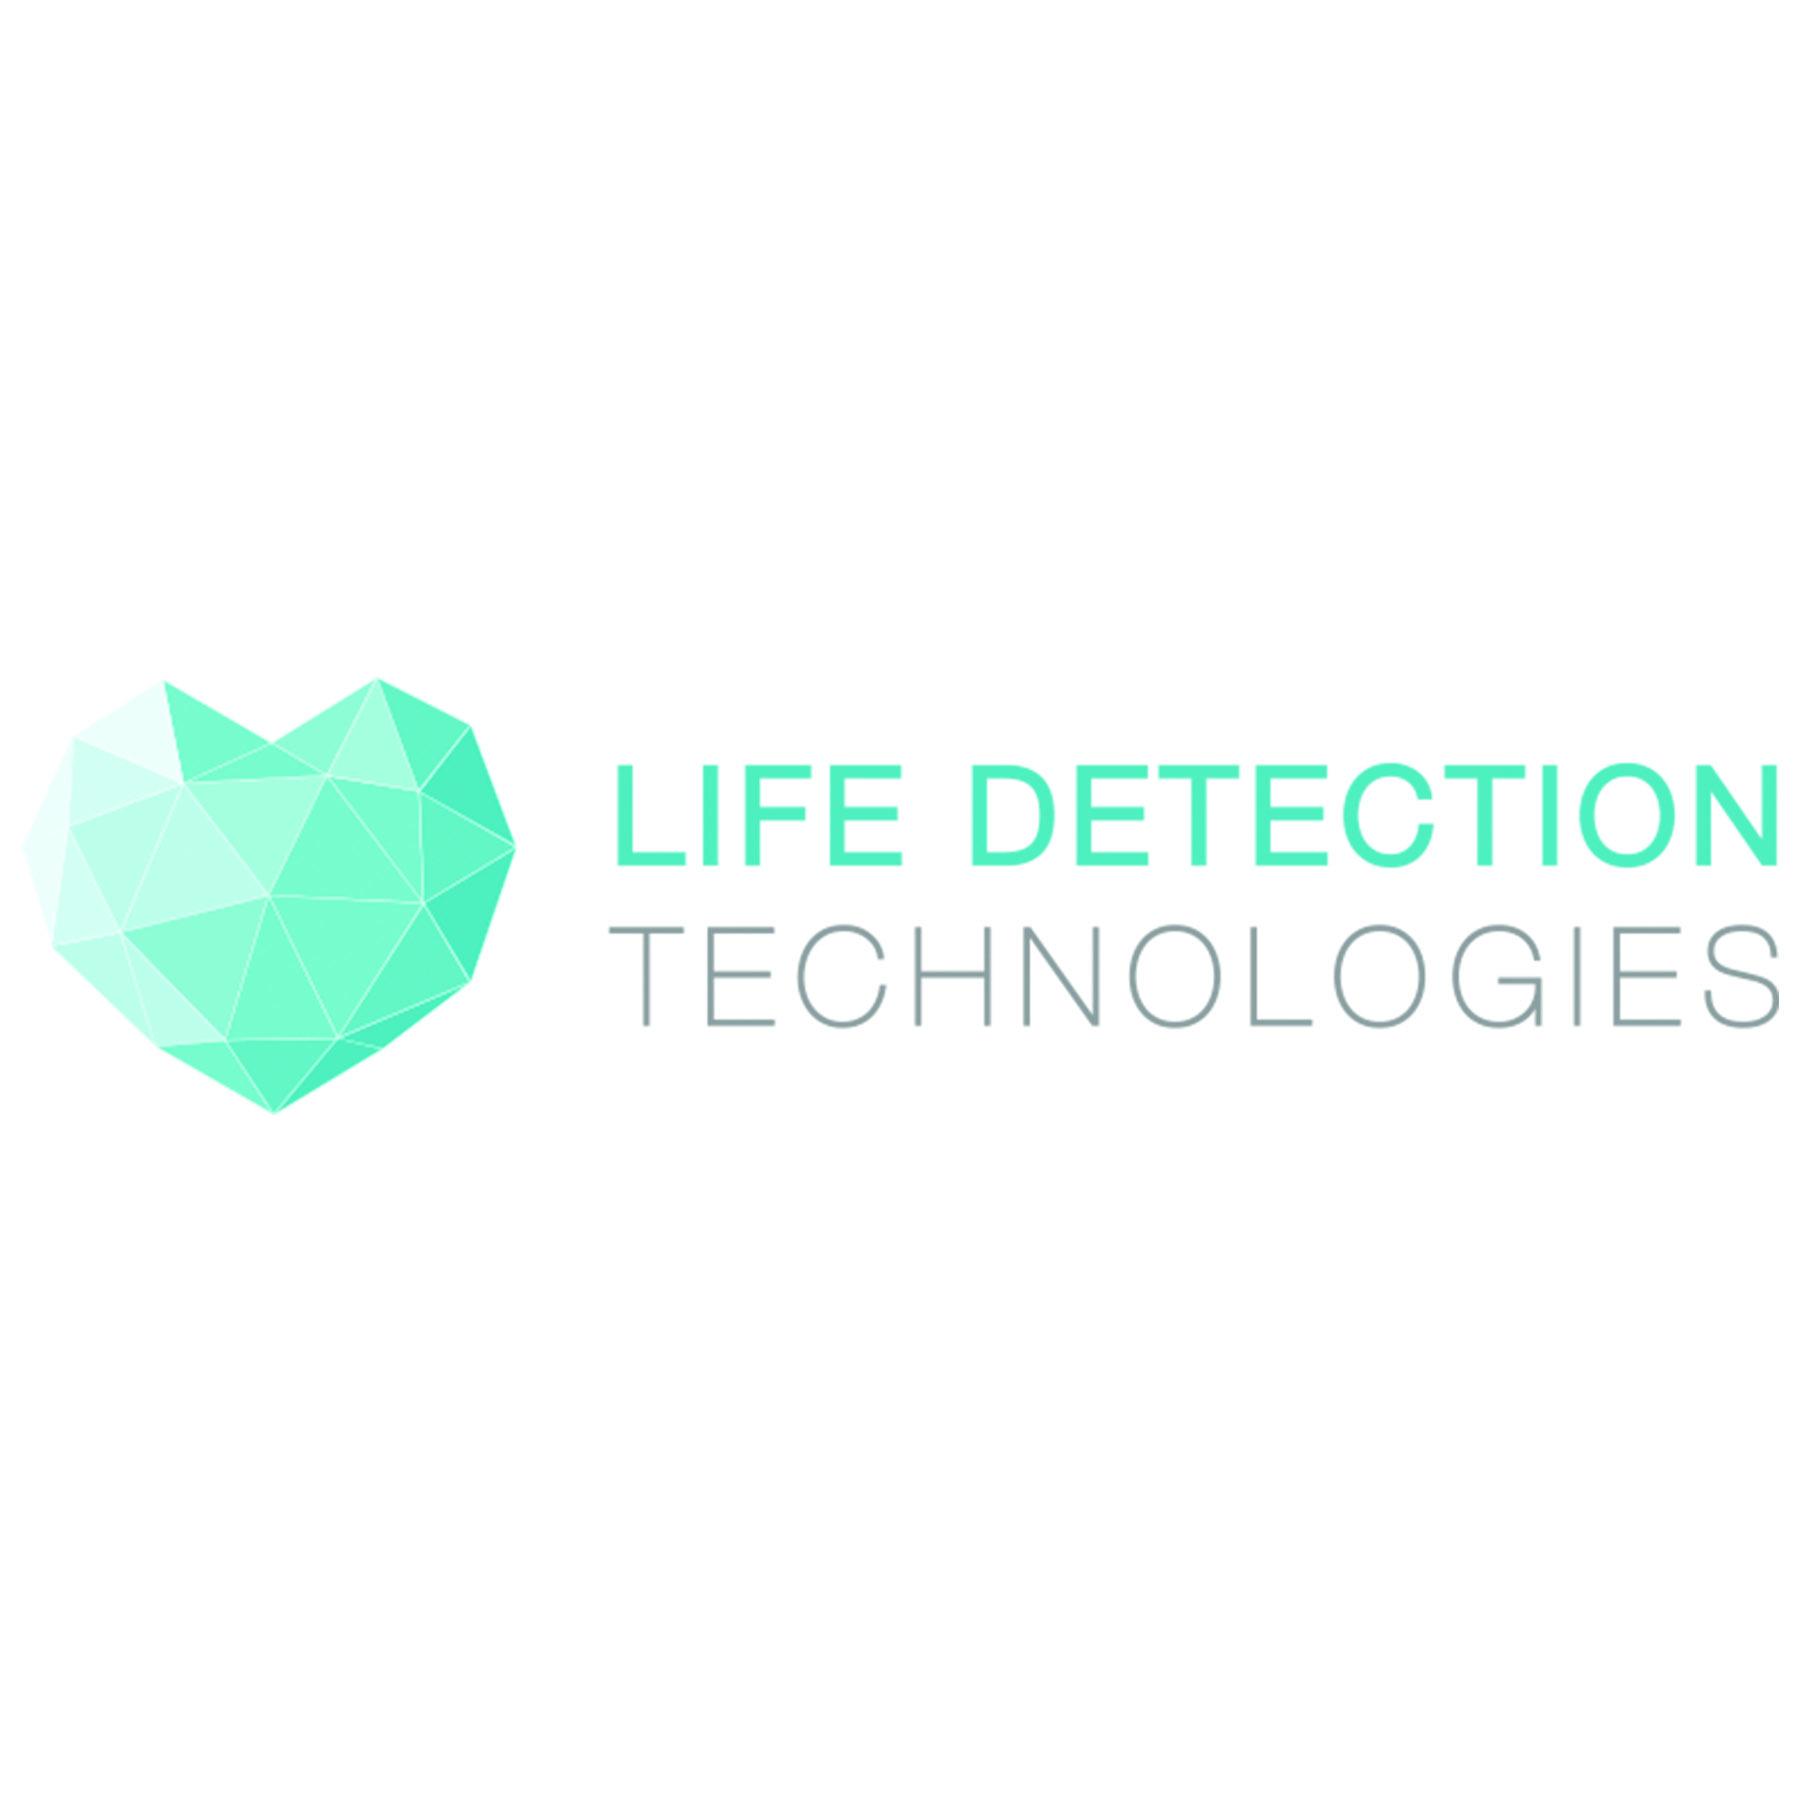 www.lifedetectiontechnologies.com